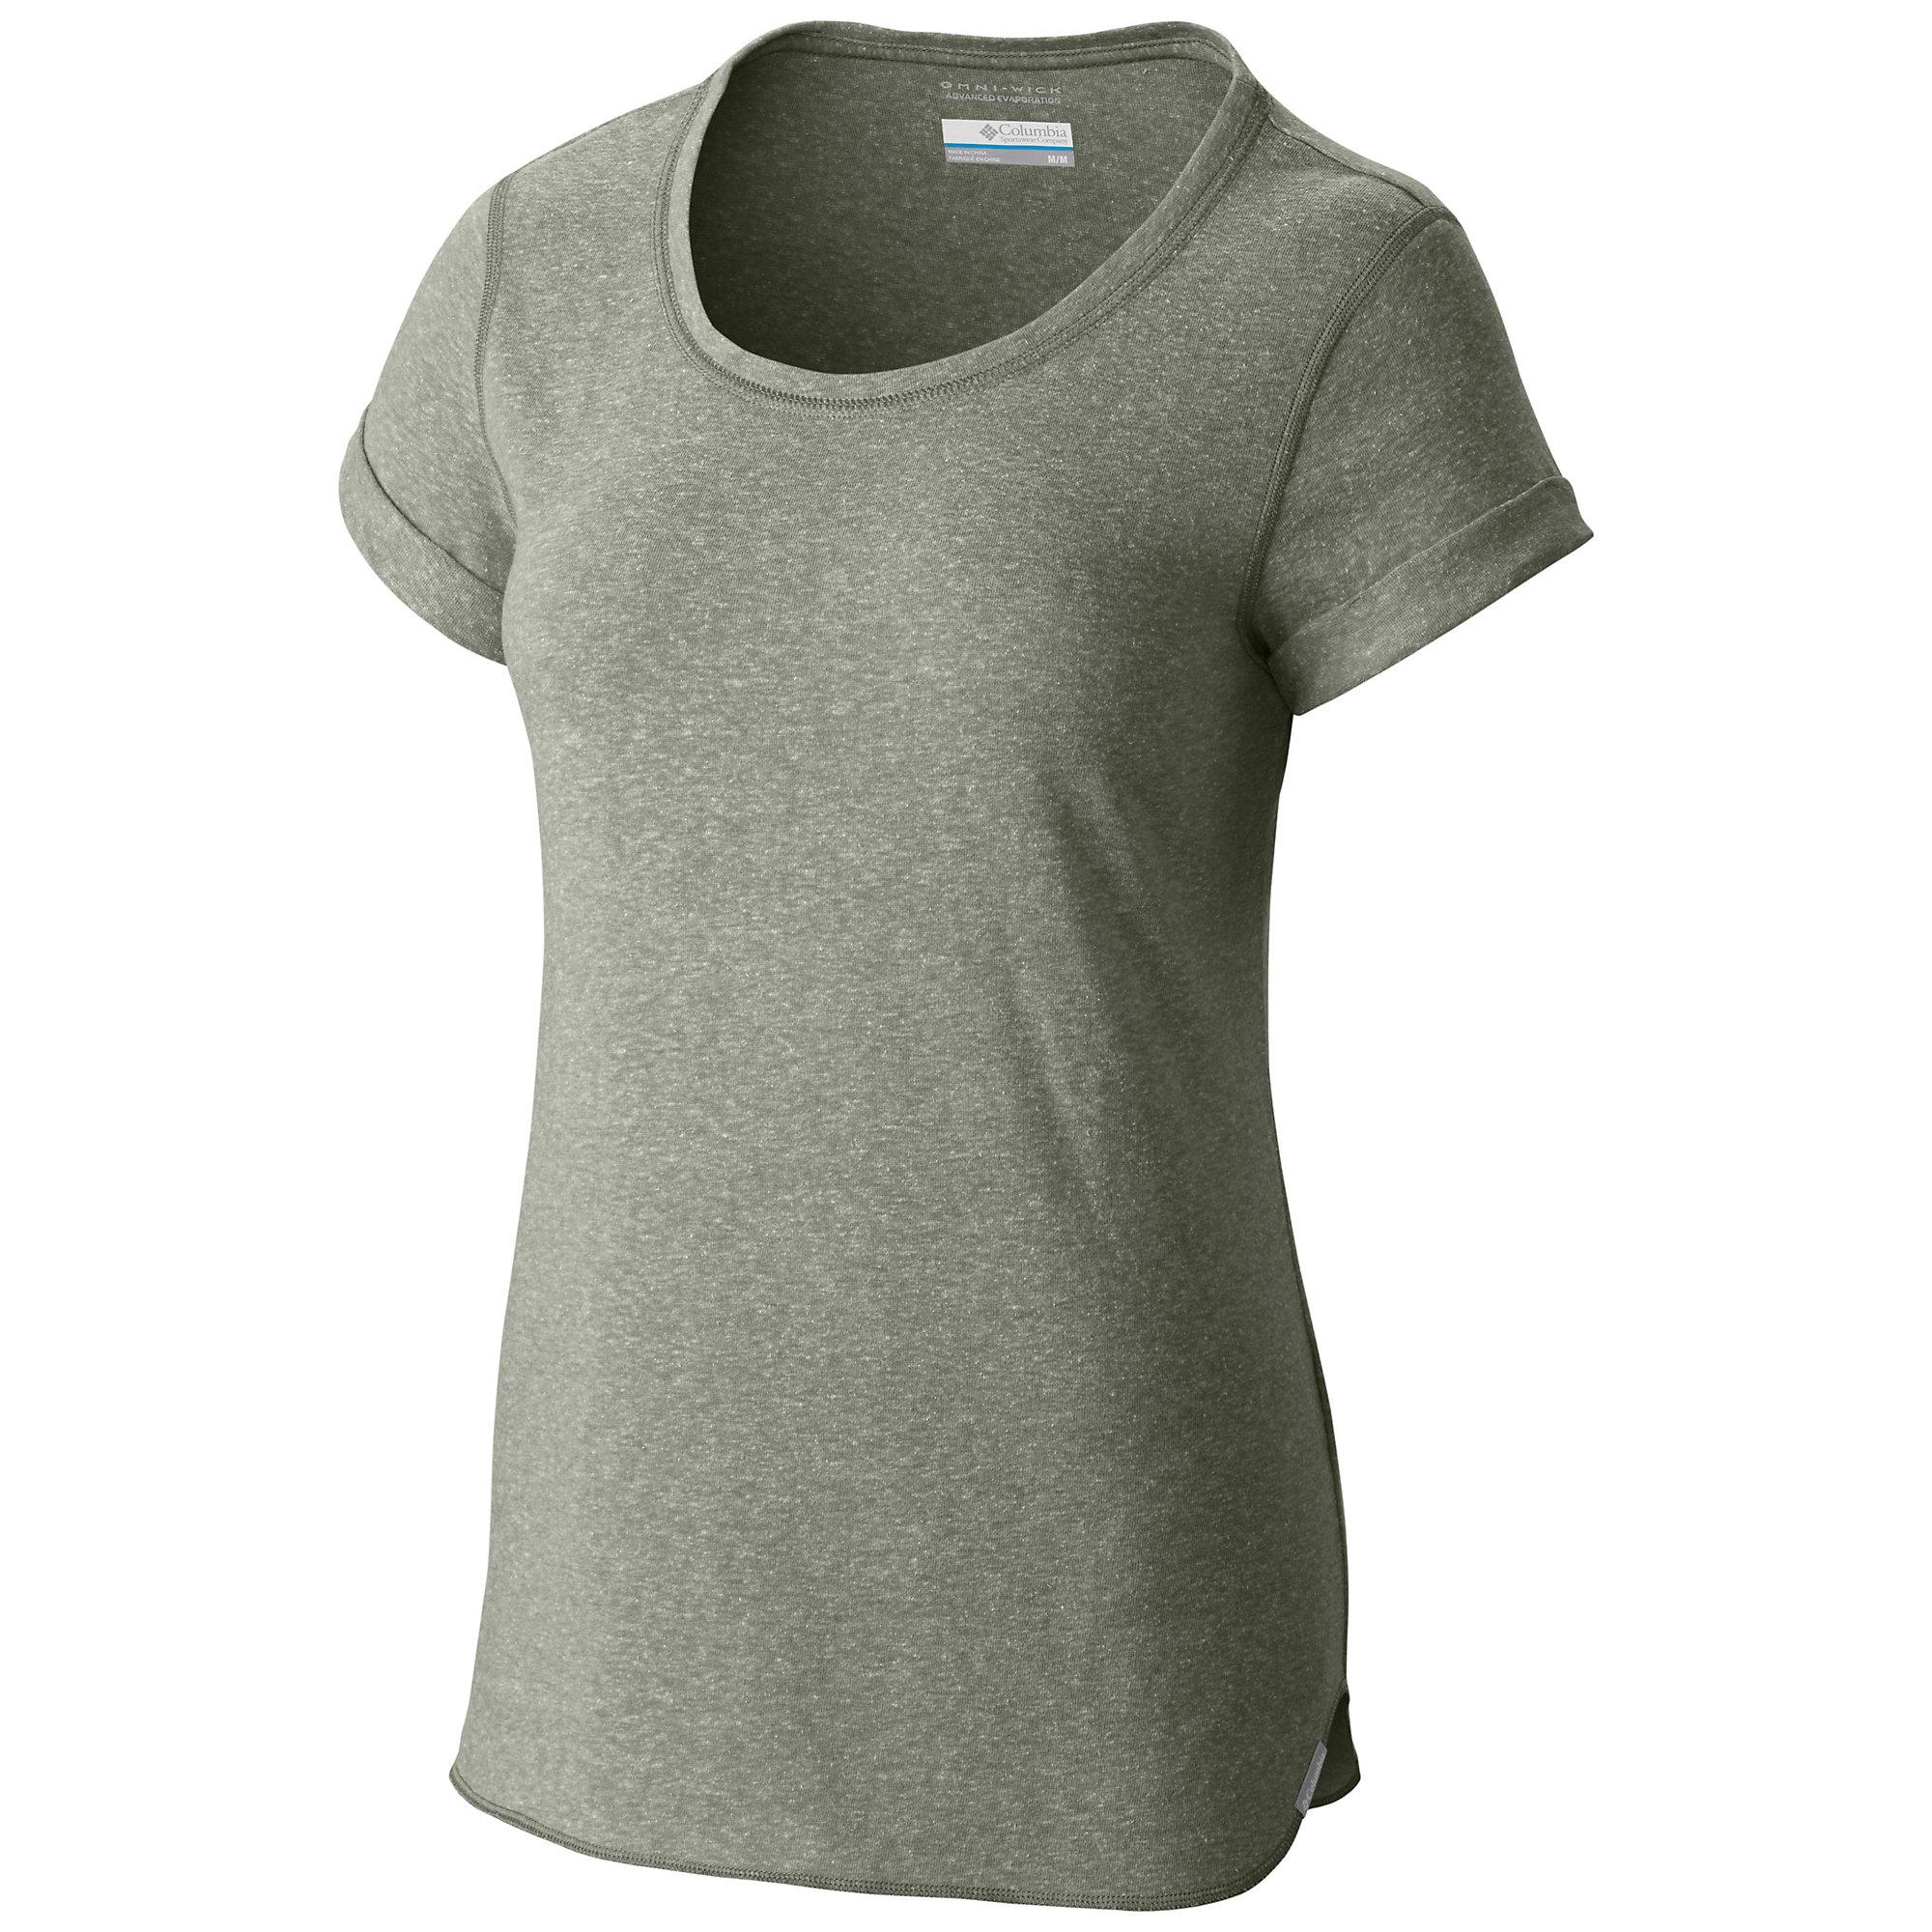 80 Femme Ou Tee Promo Shirts En Columbia Discount Total Soldes Pq0qFH